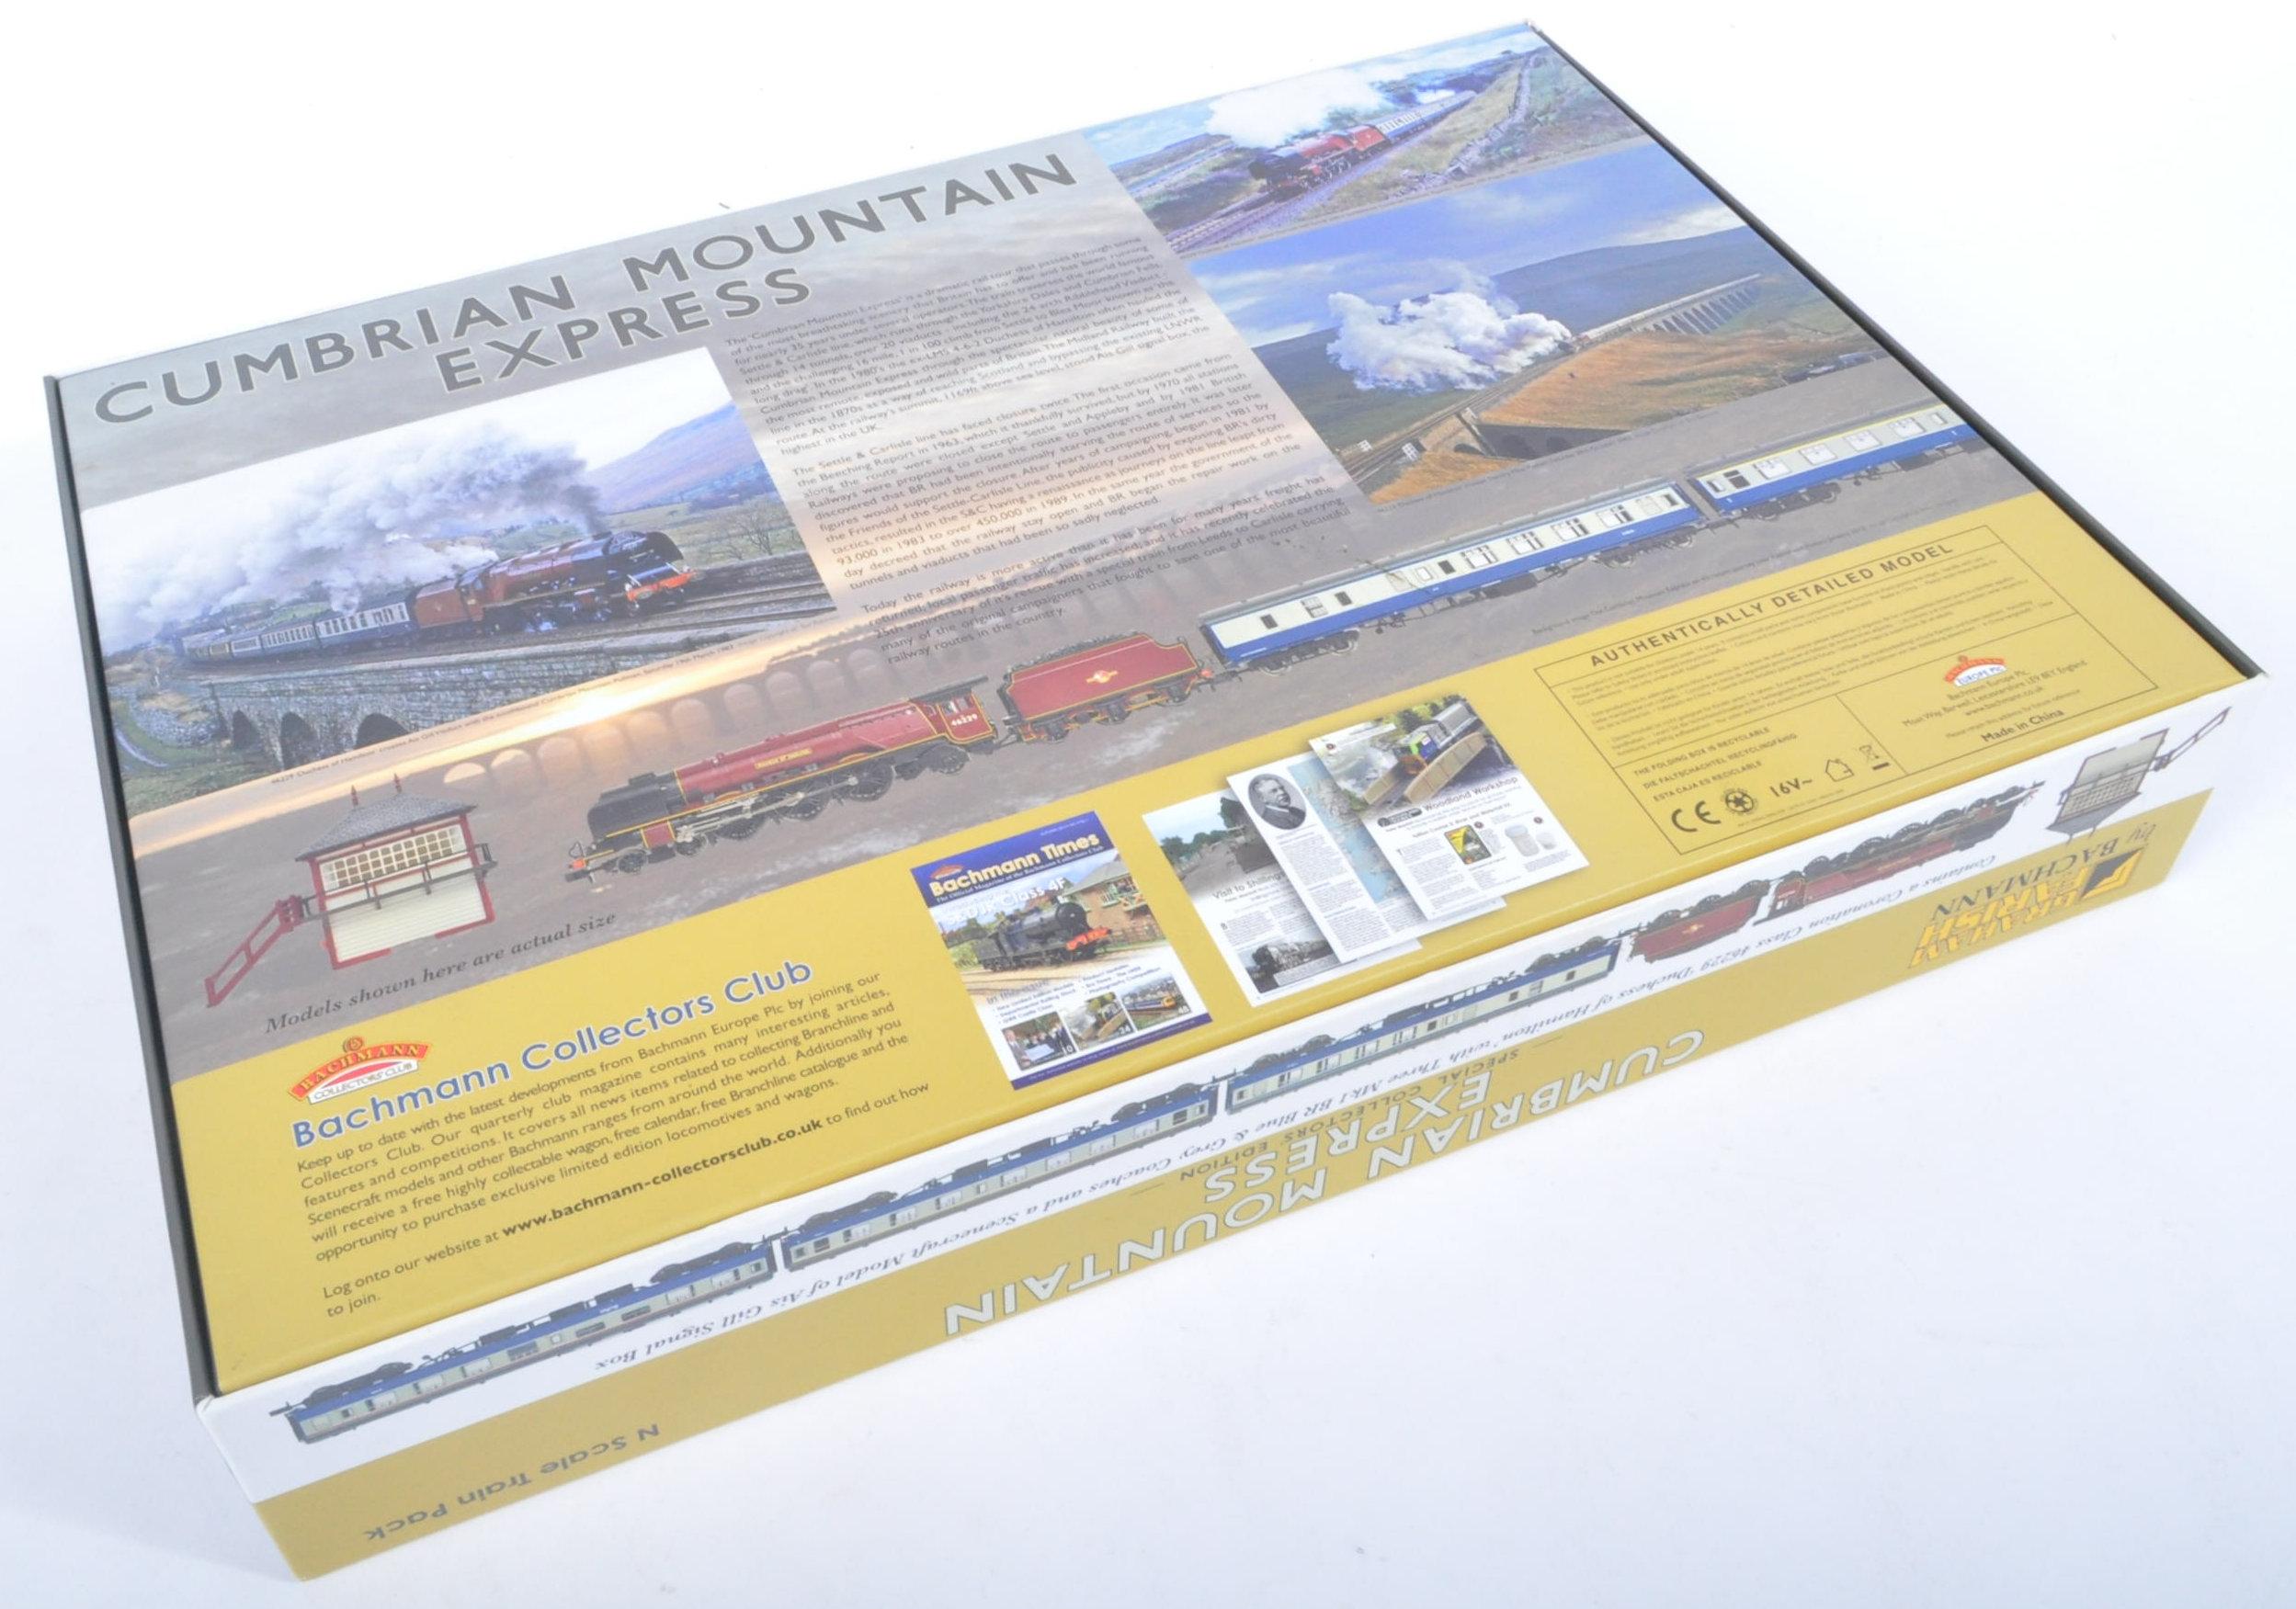 ORIGINAL BOXED GRAHAM FARISH CUMBRIAN MOUNTAIN EXPRESS TRAINSET - Image 9 of 9